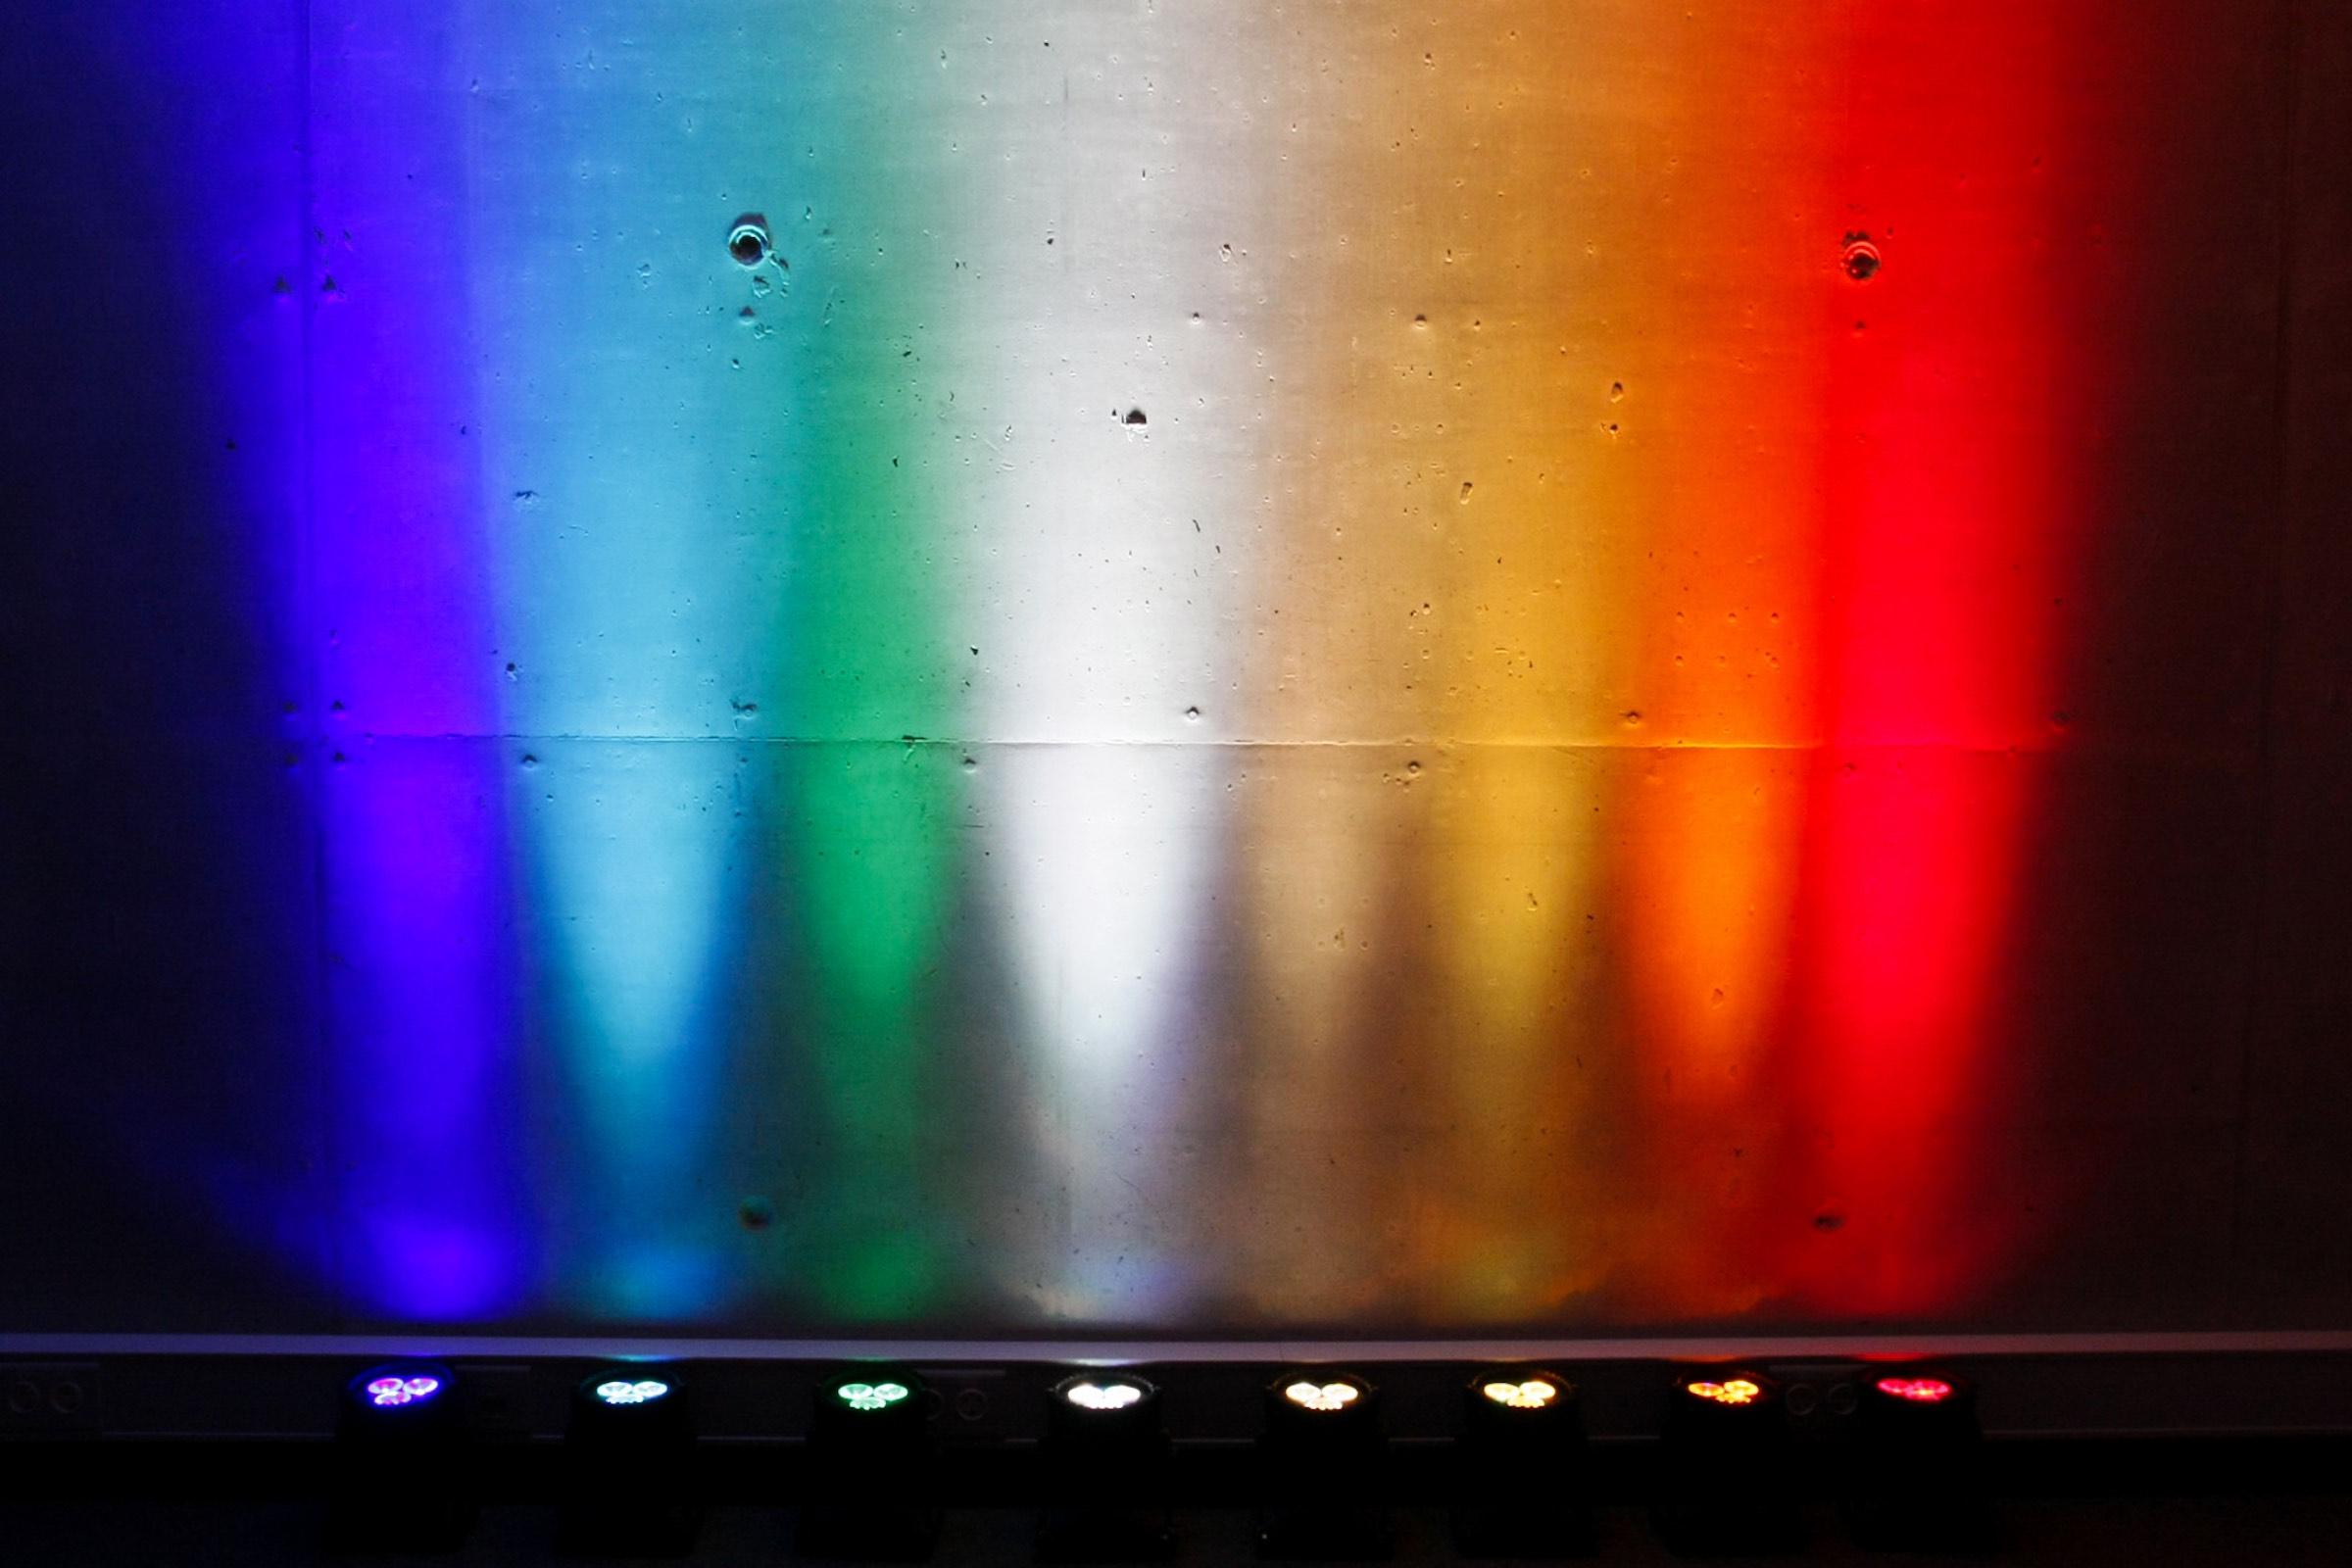 lichttechnik | Indoor | Hannover | Firmenfeier | Ambientebeleuchtung | Gala | Hochzeit | Show | Raumbeleuchtung | Akku | LED | Indoor | Spots | Scheinwerfer | Mieten | Buchen | Lehmann | Eventservice